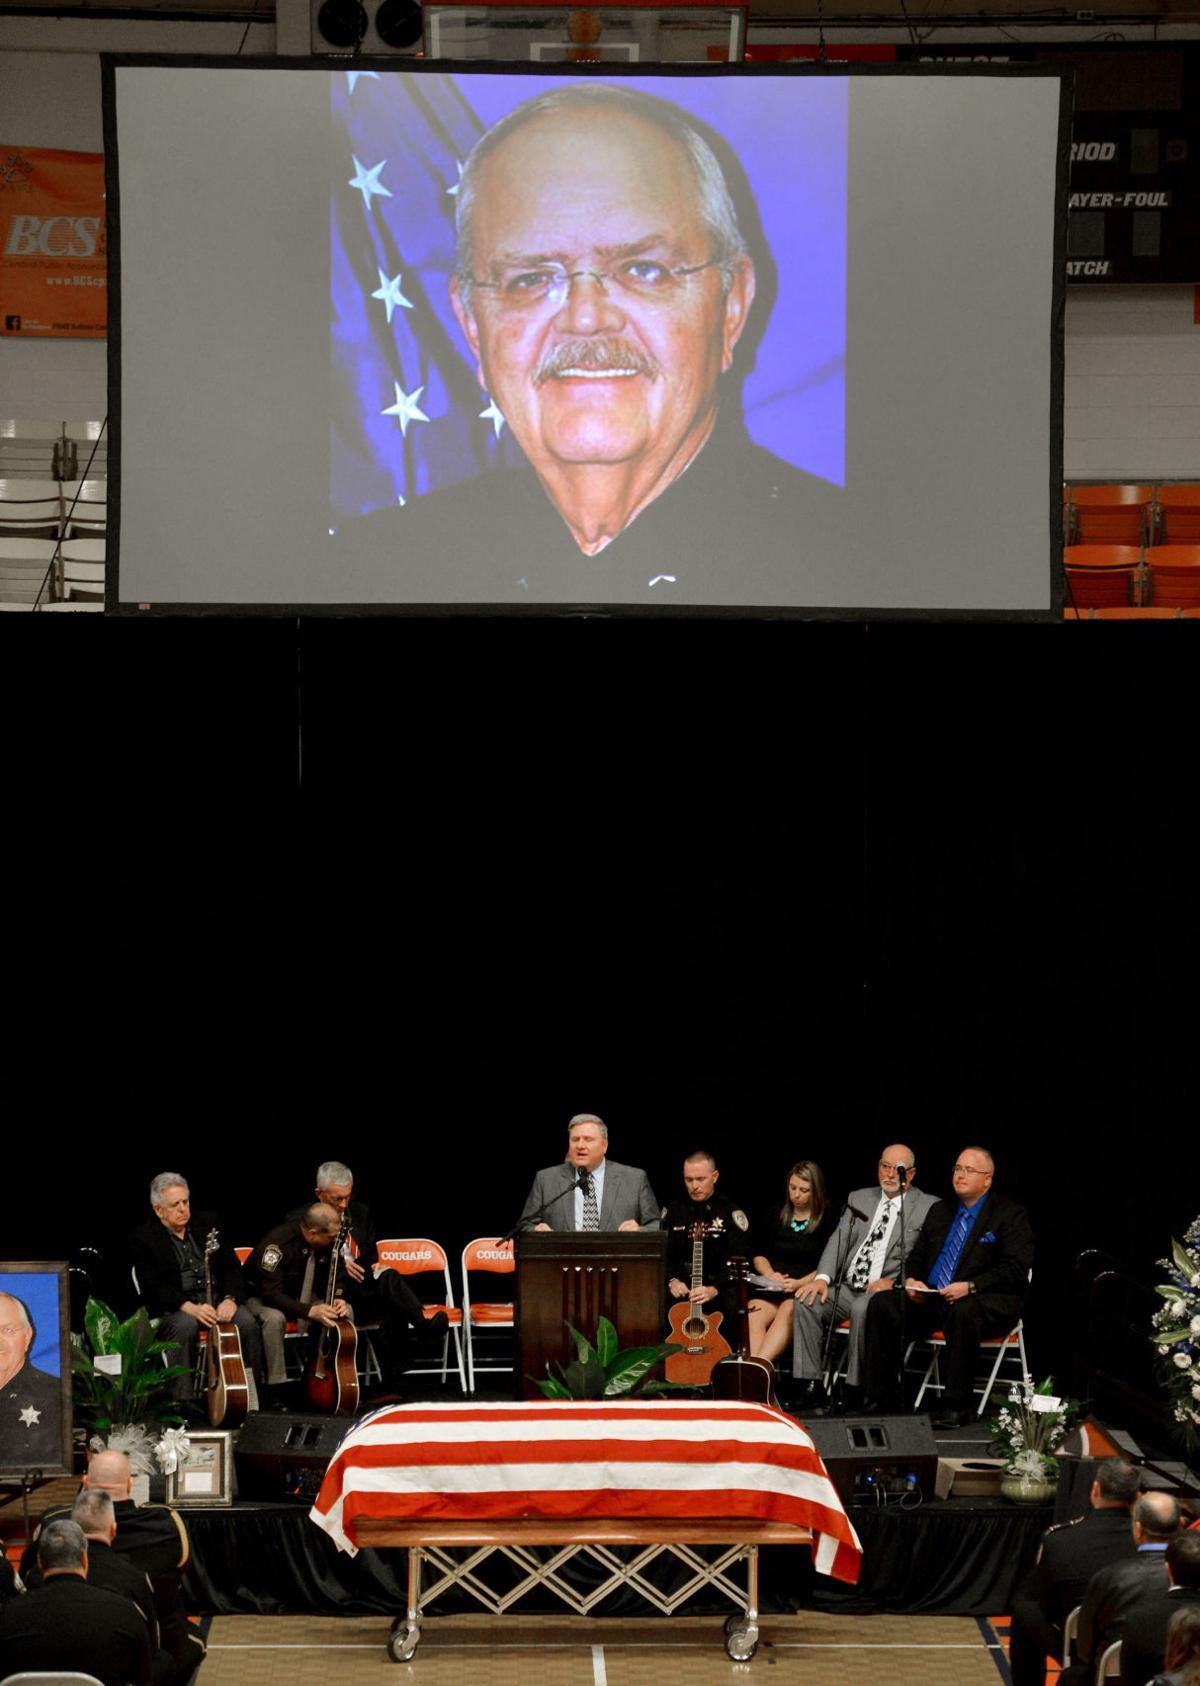 BHC 03032019 Sgt Steve Hinkle Funeral 14